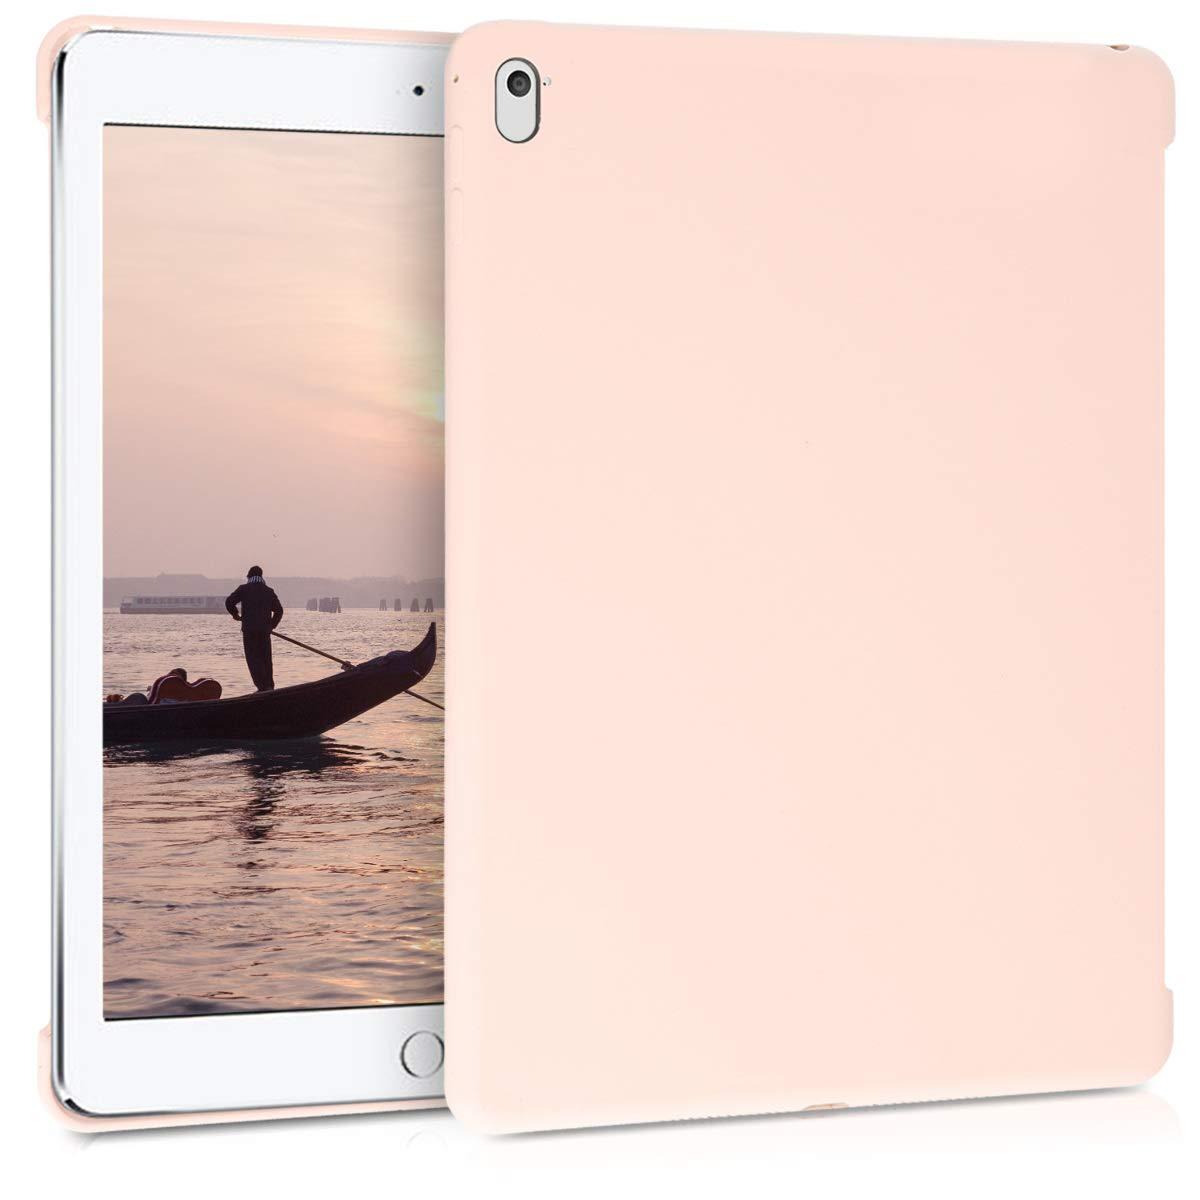 kwmobile TPUシリコンケース Apple iPad Air 2用 - ソフトスマートカバー互換保護カバー - ブラック ピンク 46691.10  .antique pink B07LCQL1S8